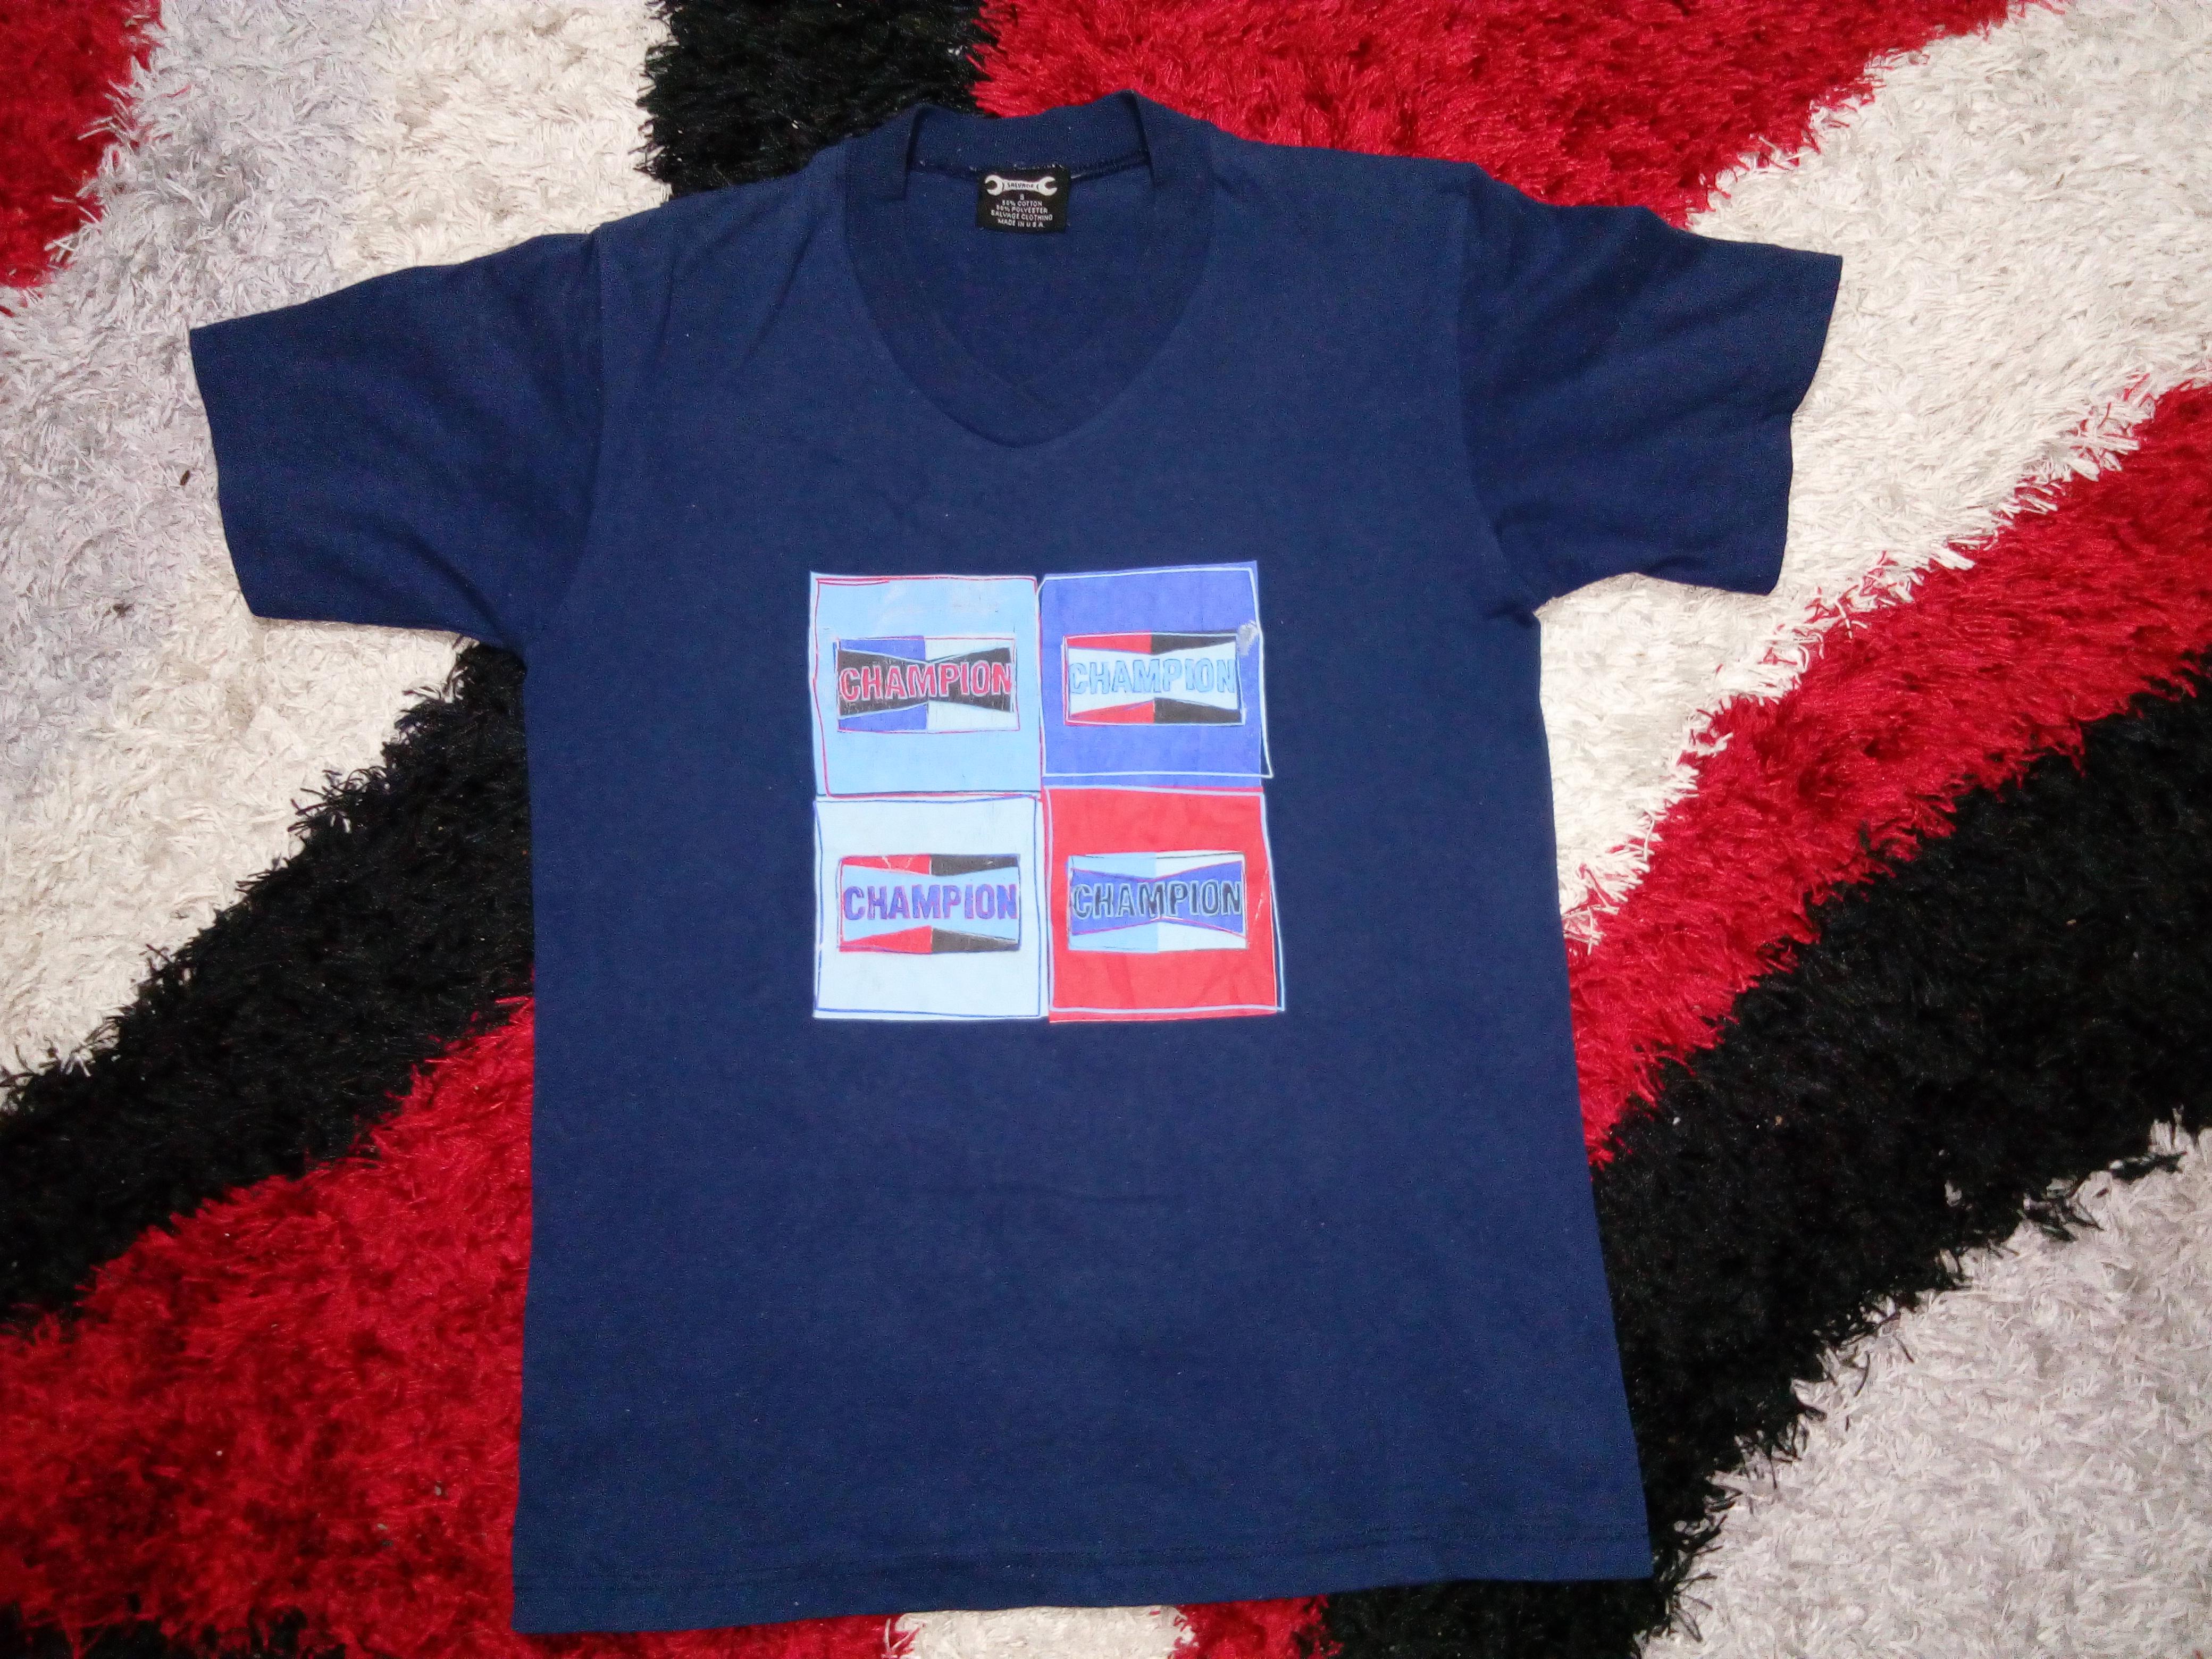 2e49d1b2dbe9 Vintage ×. RARE!!! Vintage 90 s Champion Spark Plug T-Shirt ...